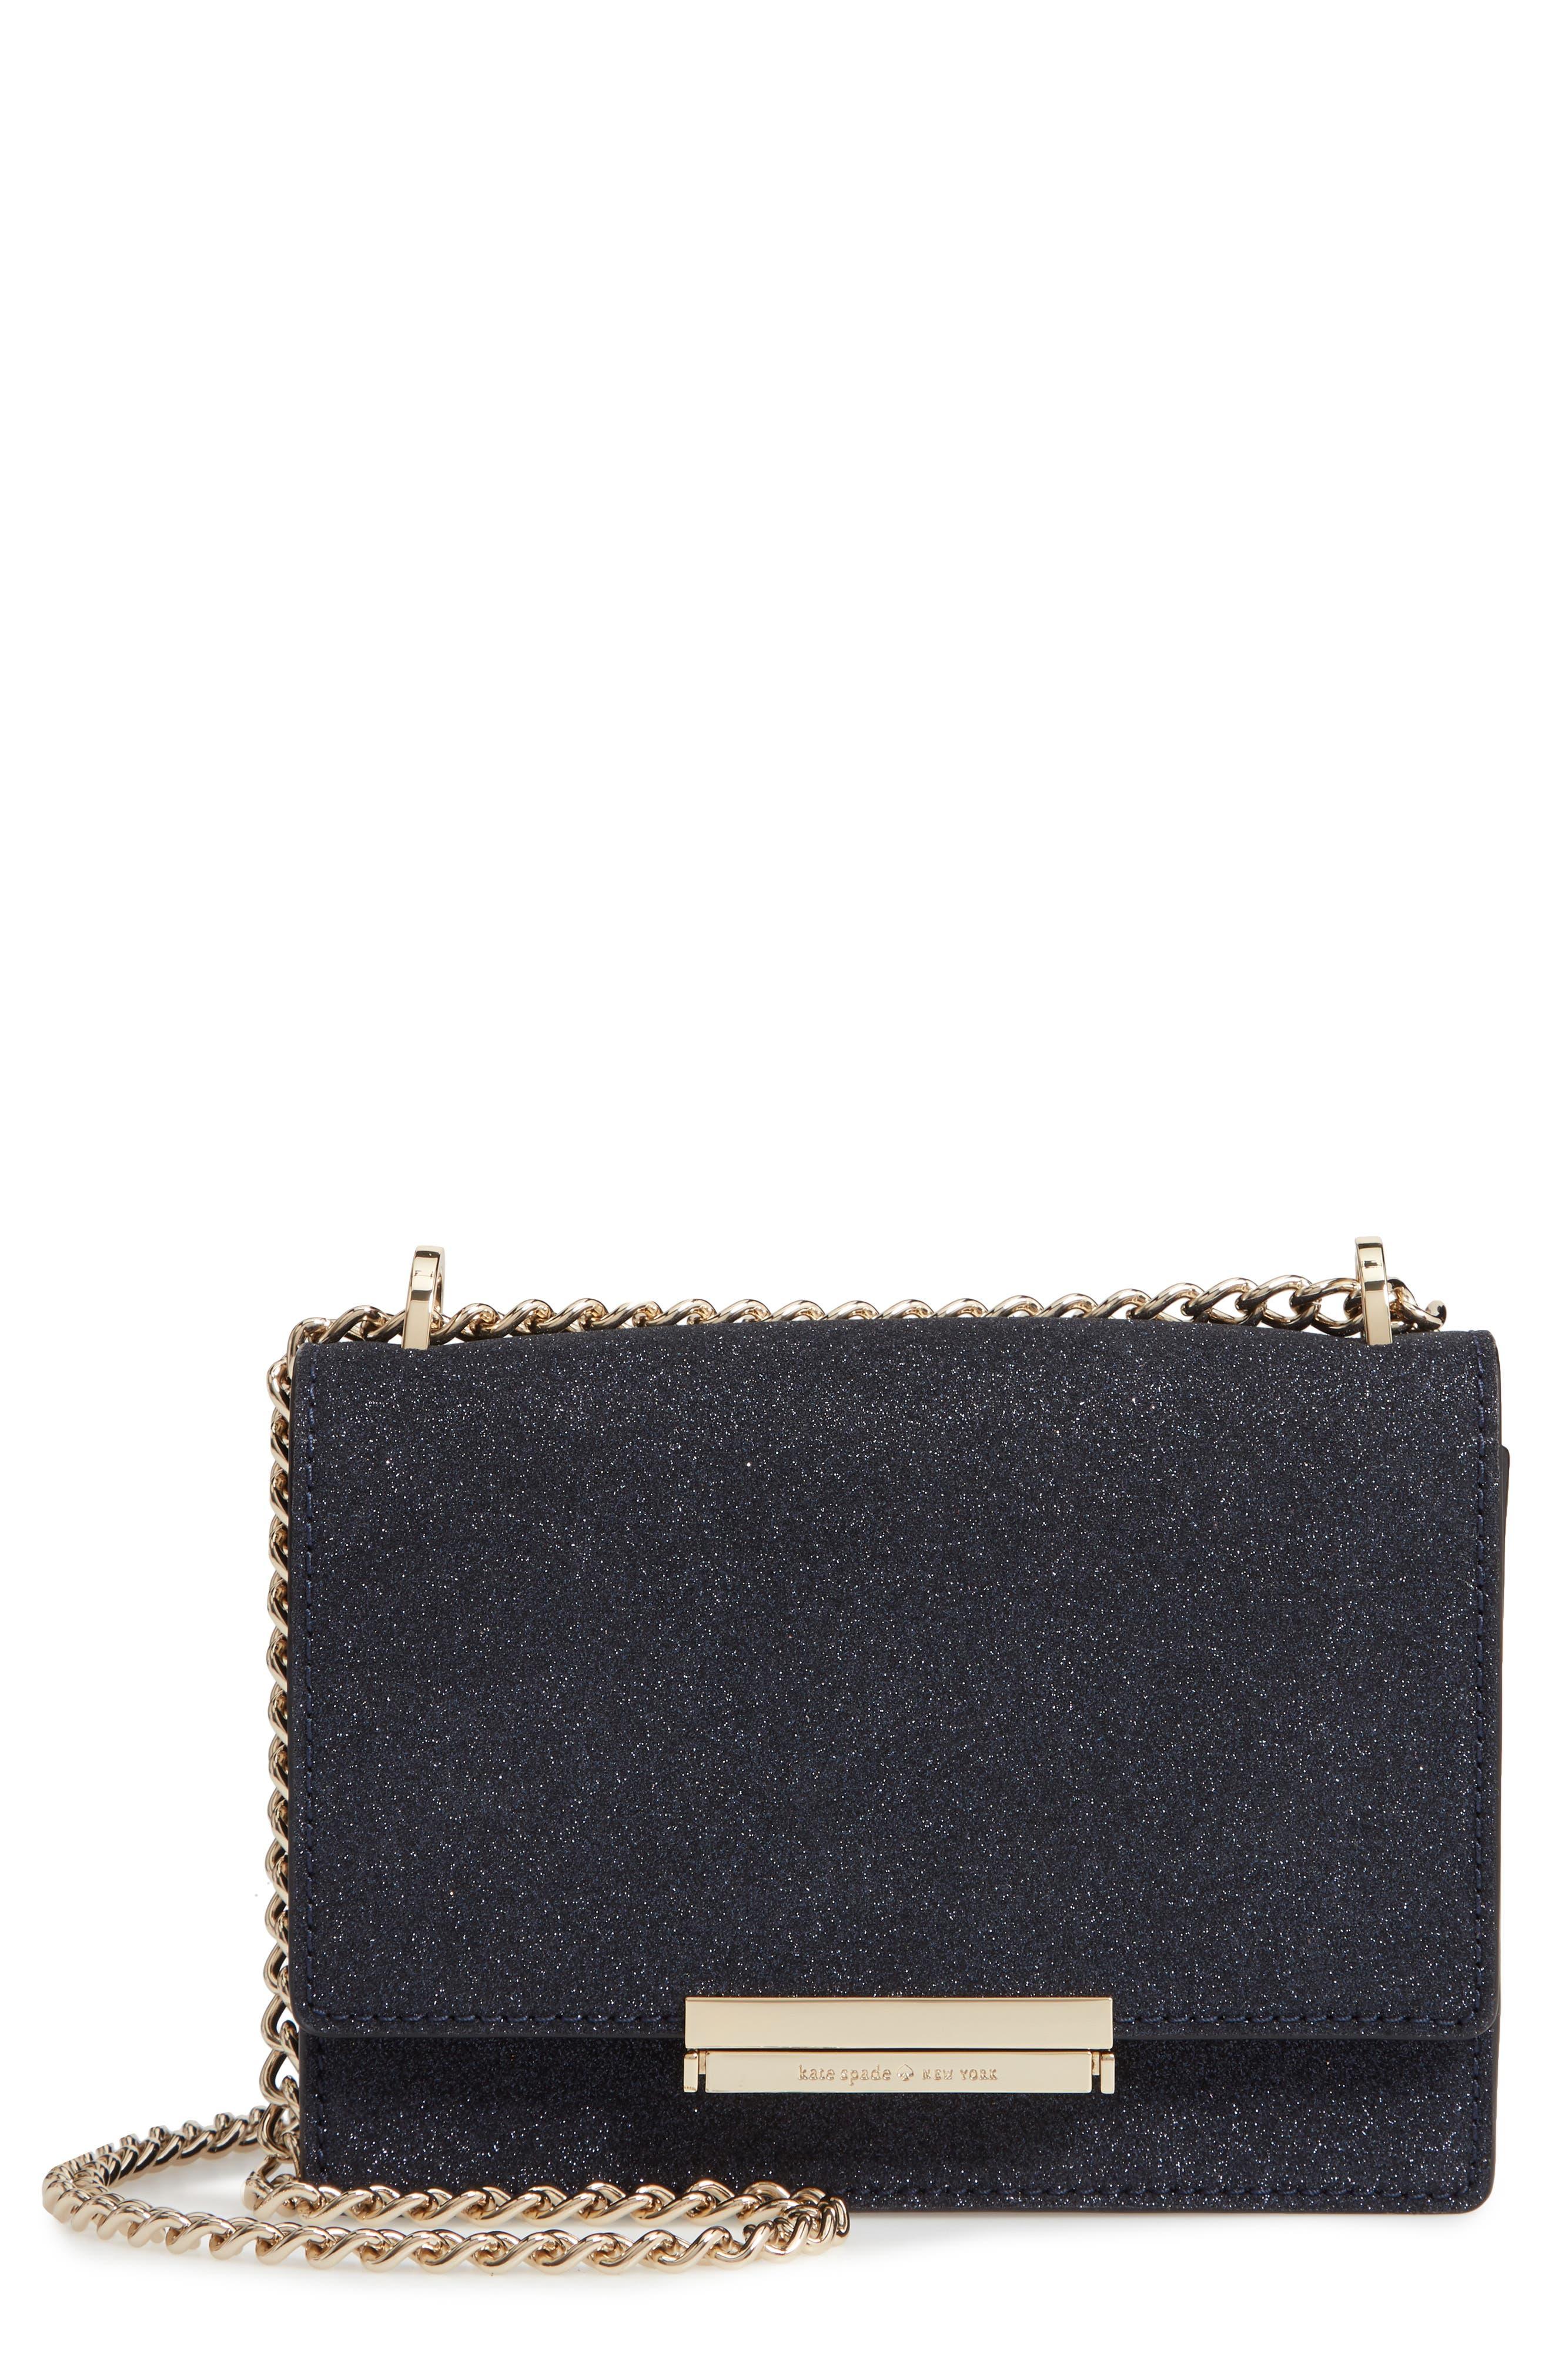 burgess court - hazel glitter crossbody bag, Main, color, 400